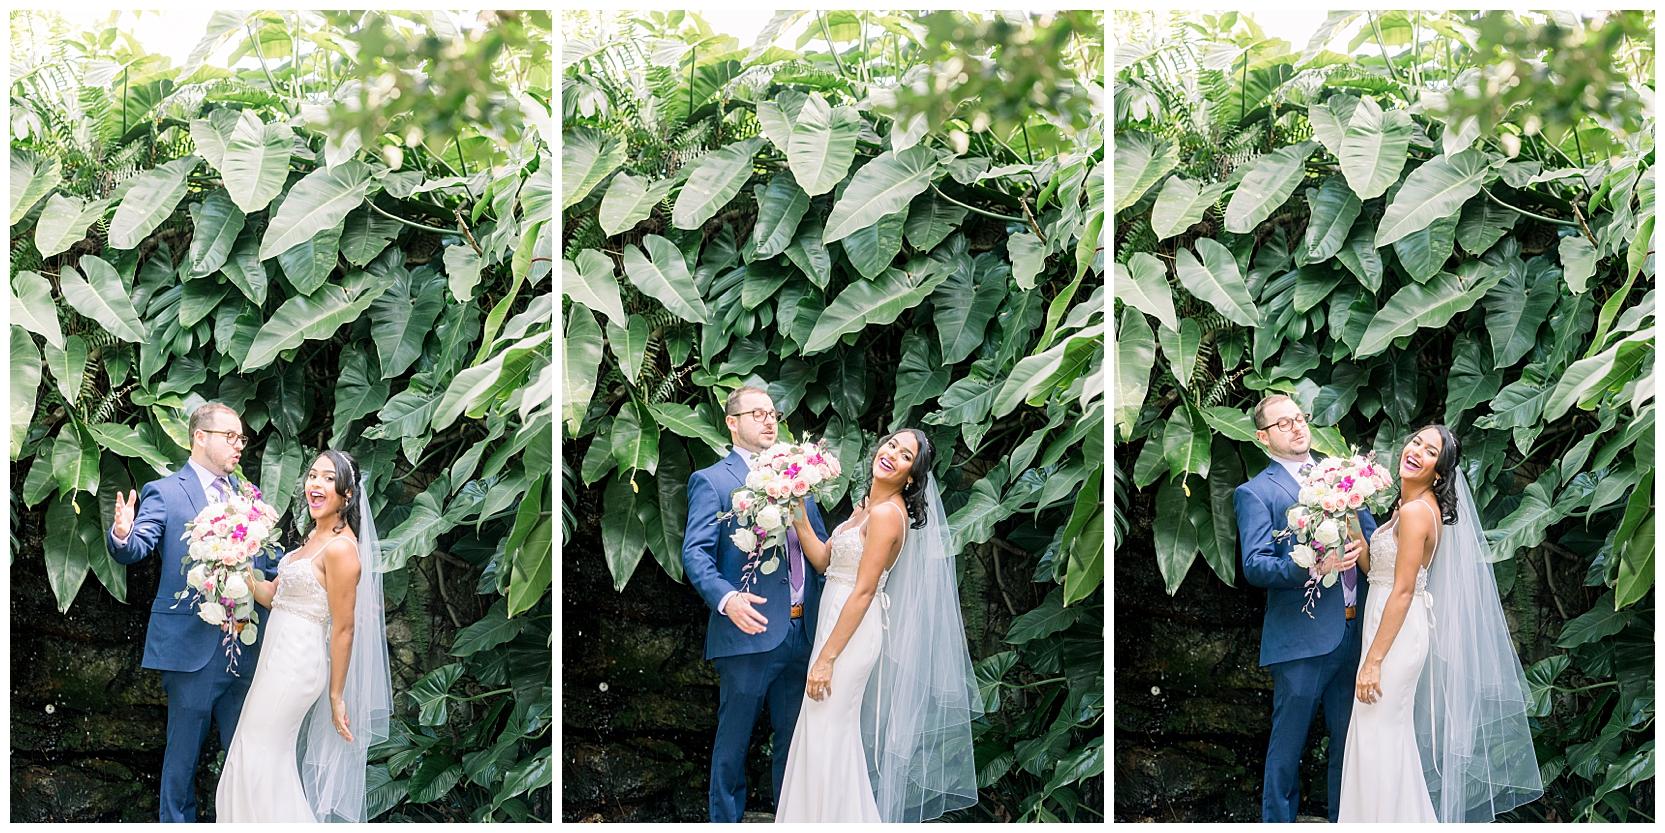 jessicafredericks_lakeland_tampa_wedding_purple_crazy hour_0035.jpg